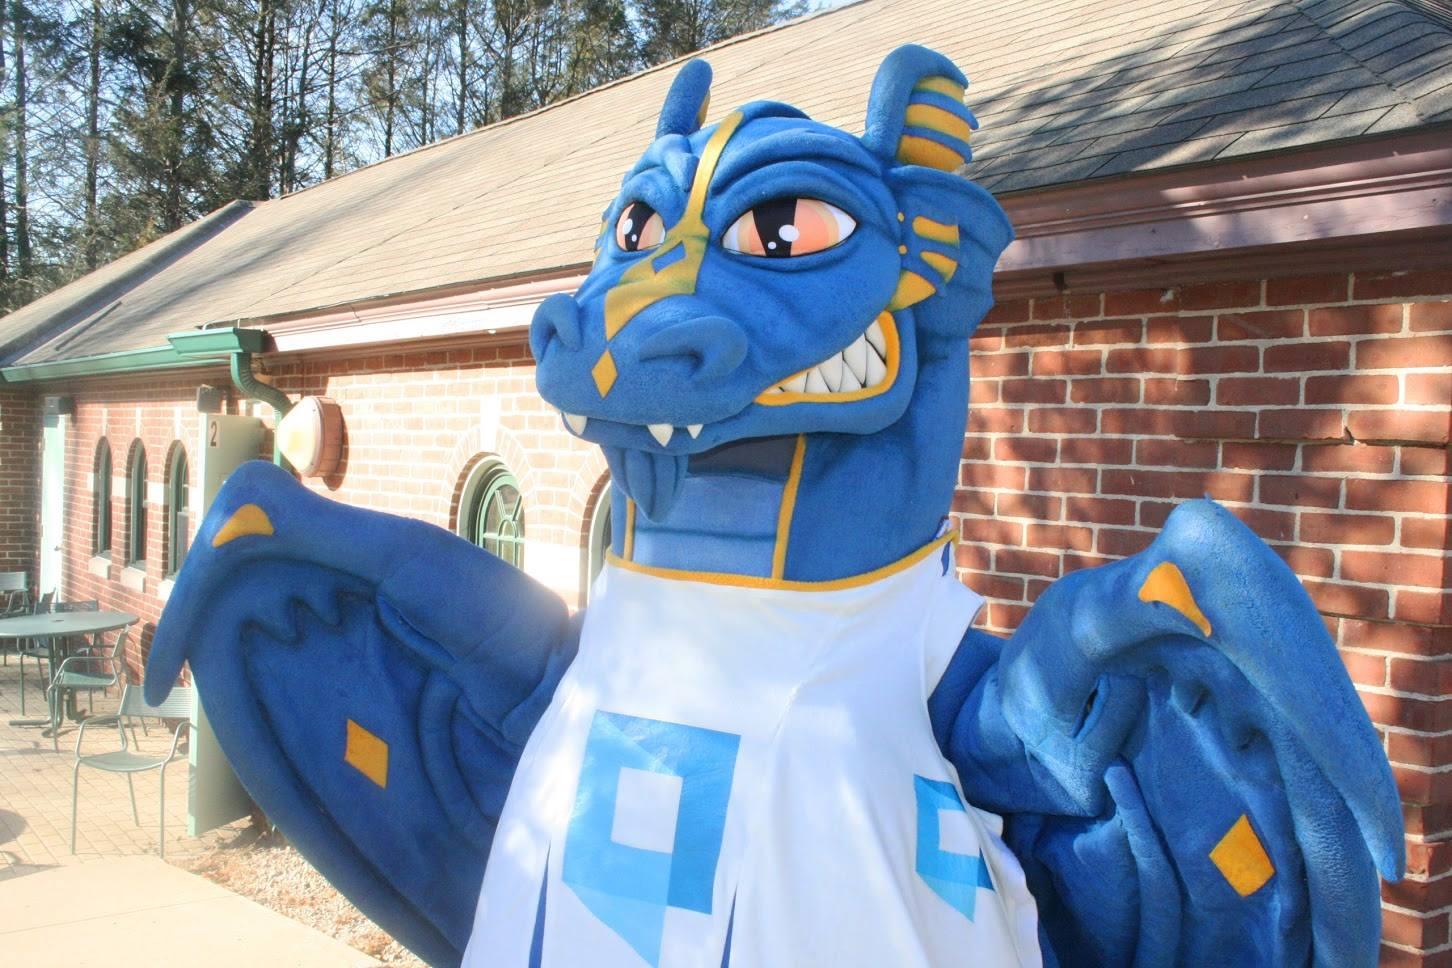 A mascot costume